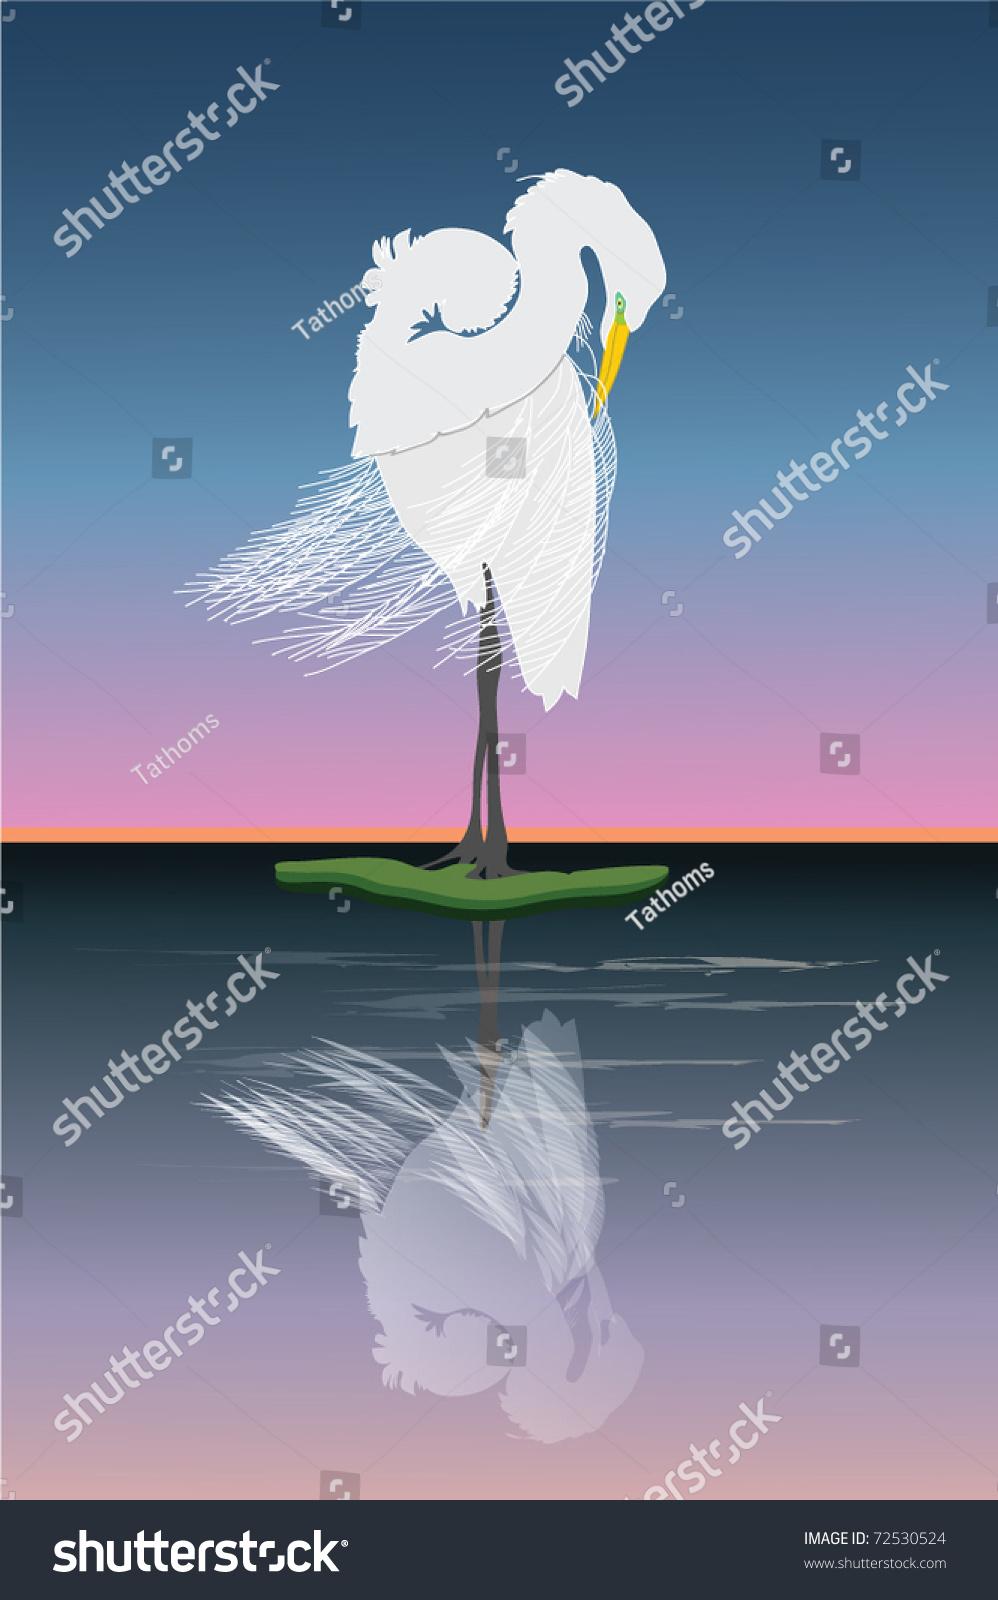 Graceful egret grooming at sunrise. My own design.